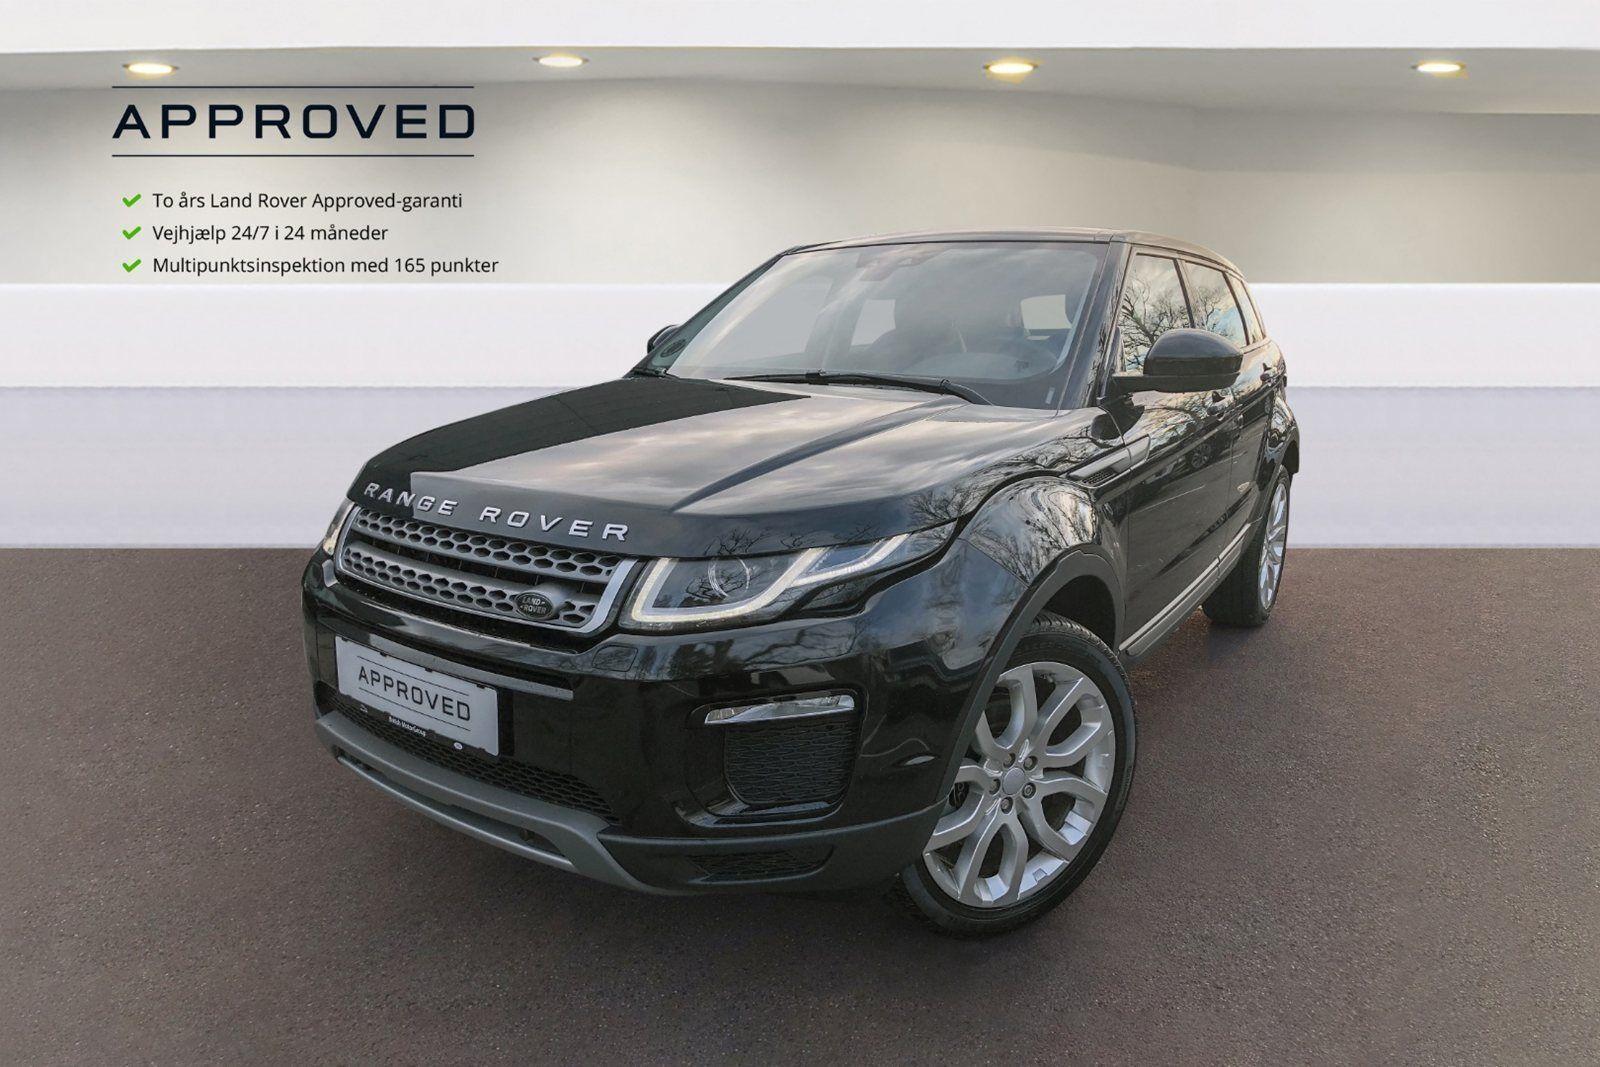 Land Rover Range Rover Evoque 2,0 TD4 150 SE aut. 5d - 599.980 kr.